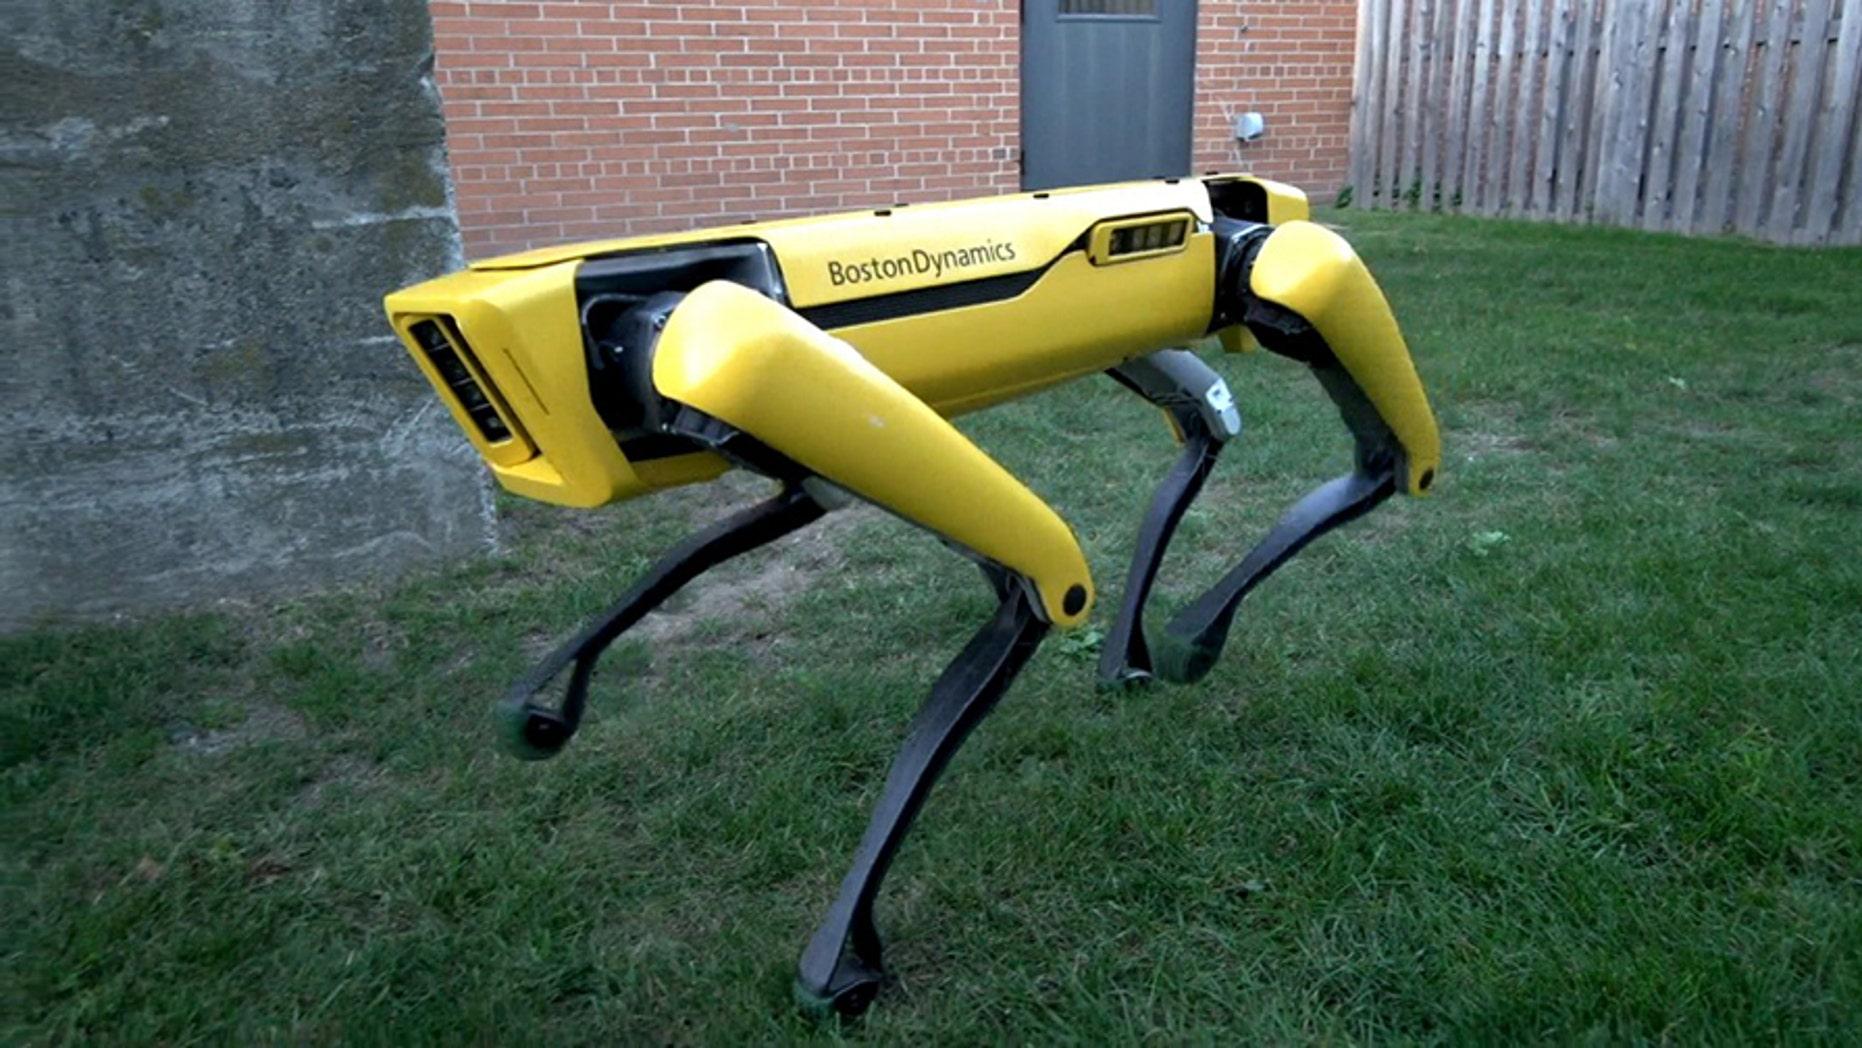 Boston Dynamics' latest SpotMini update allows the four-legged robot to open doors.